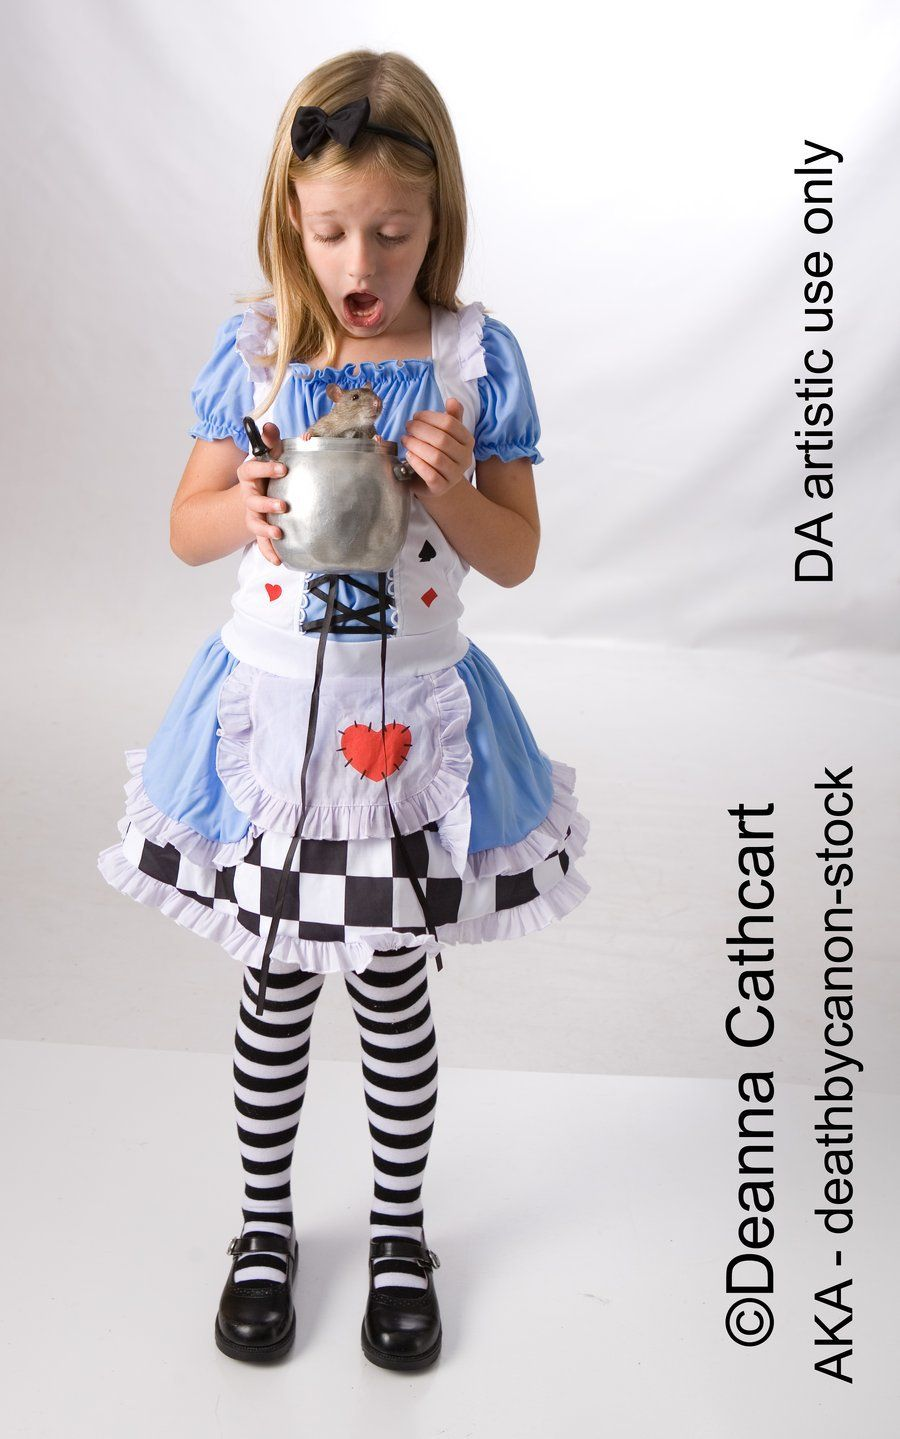 Alice 3 by deathbycanon-stock on DeviantArt